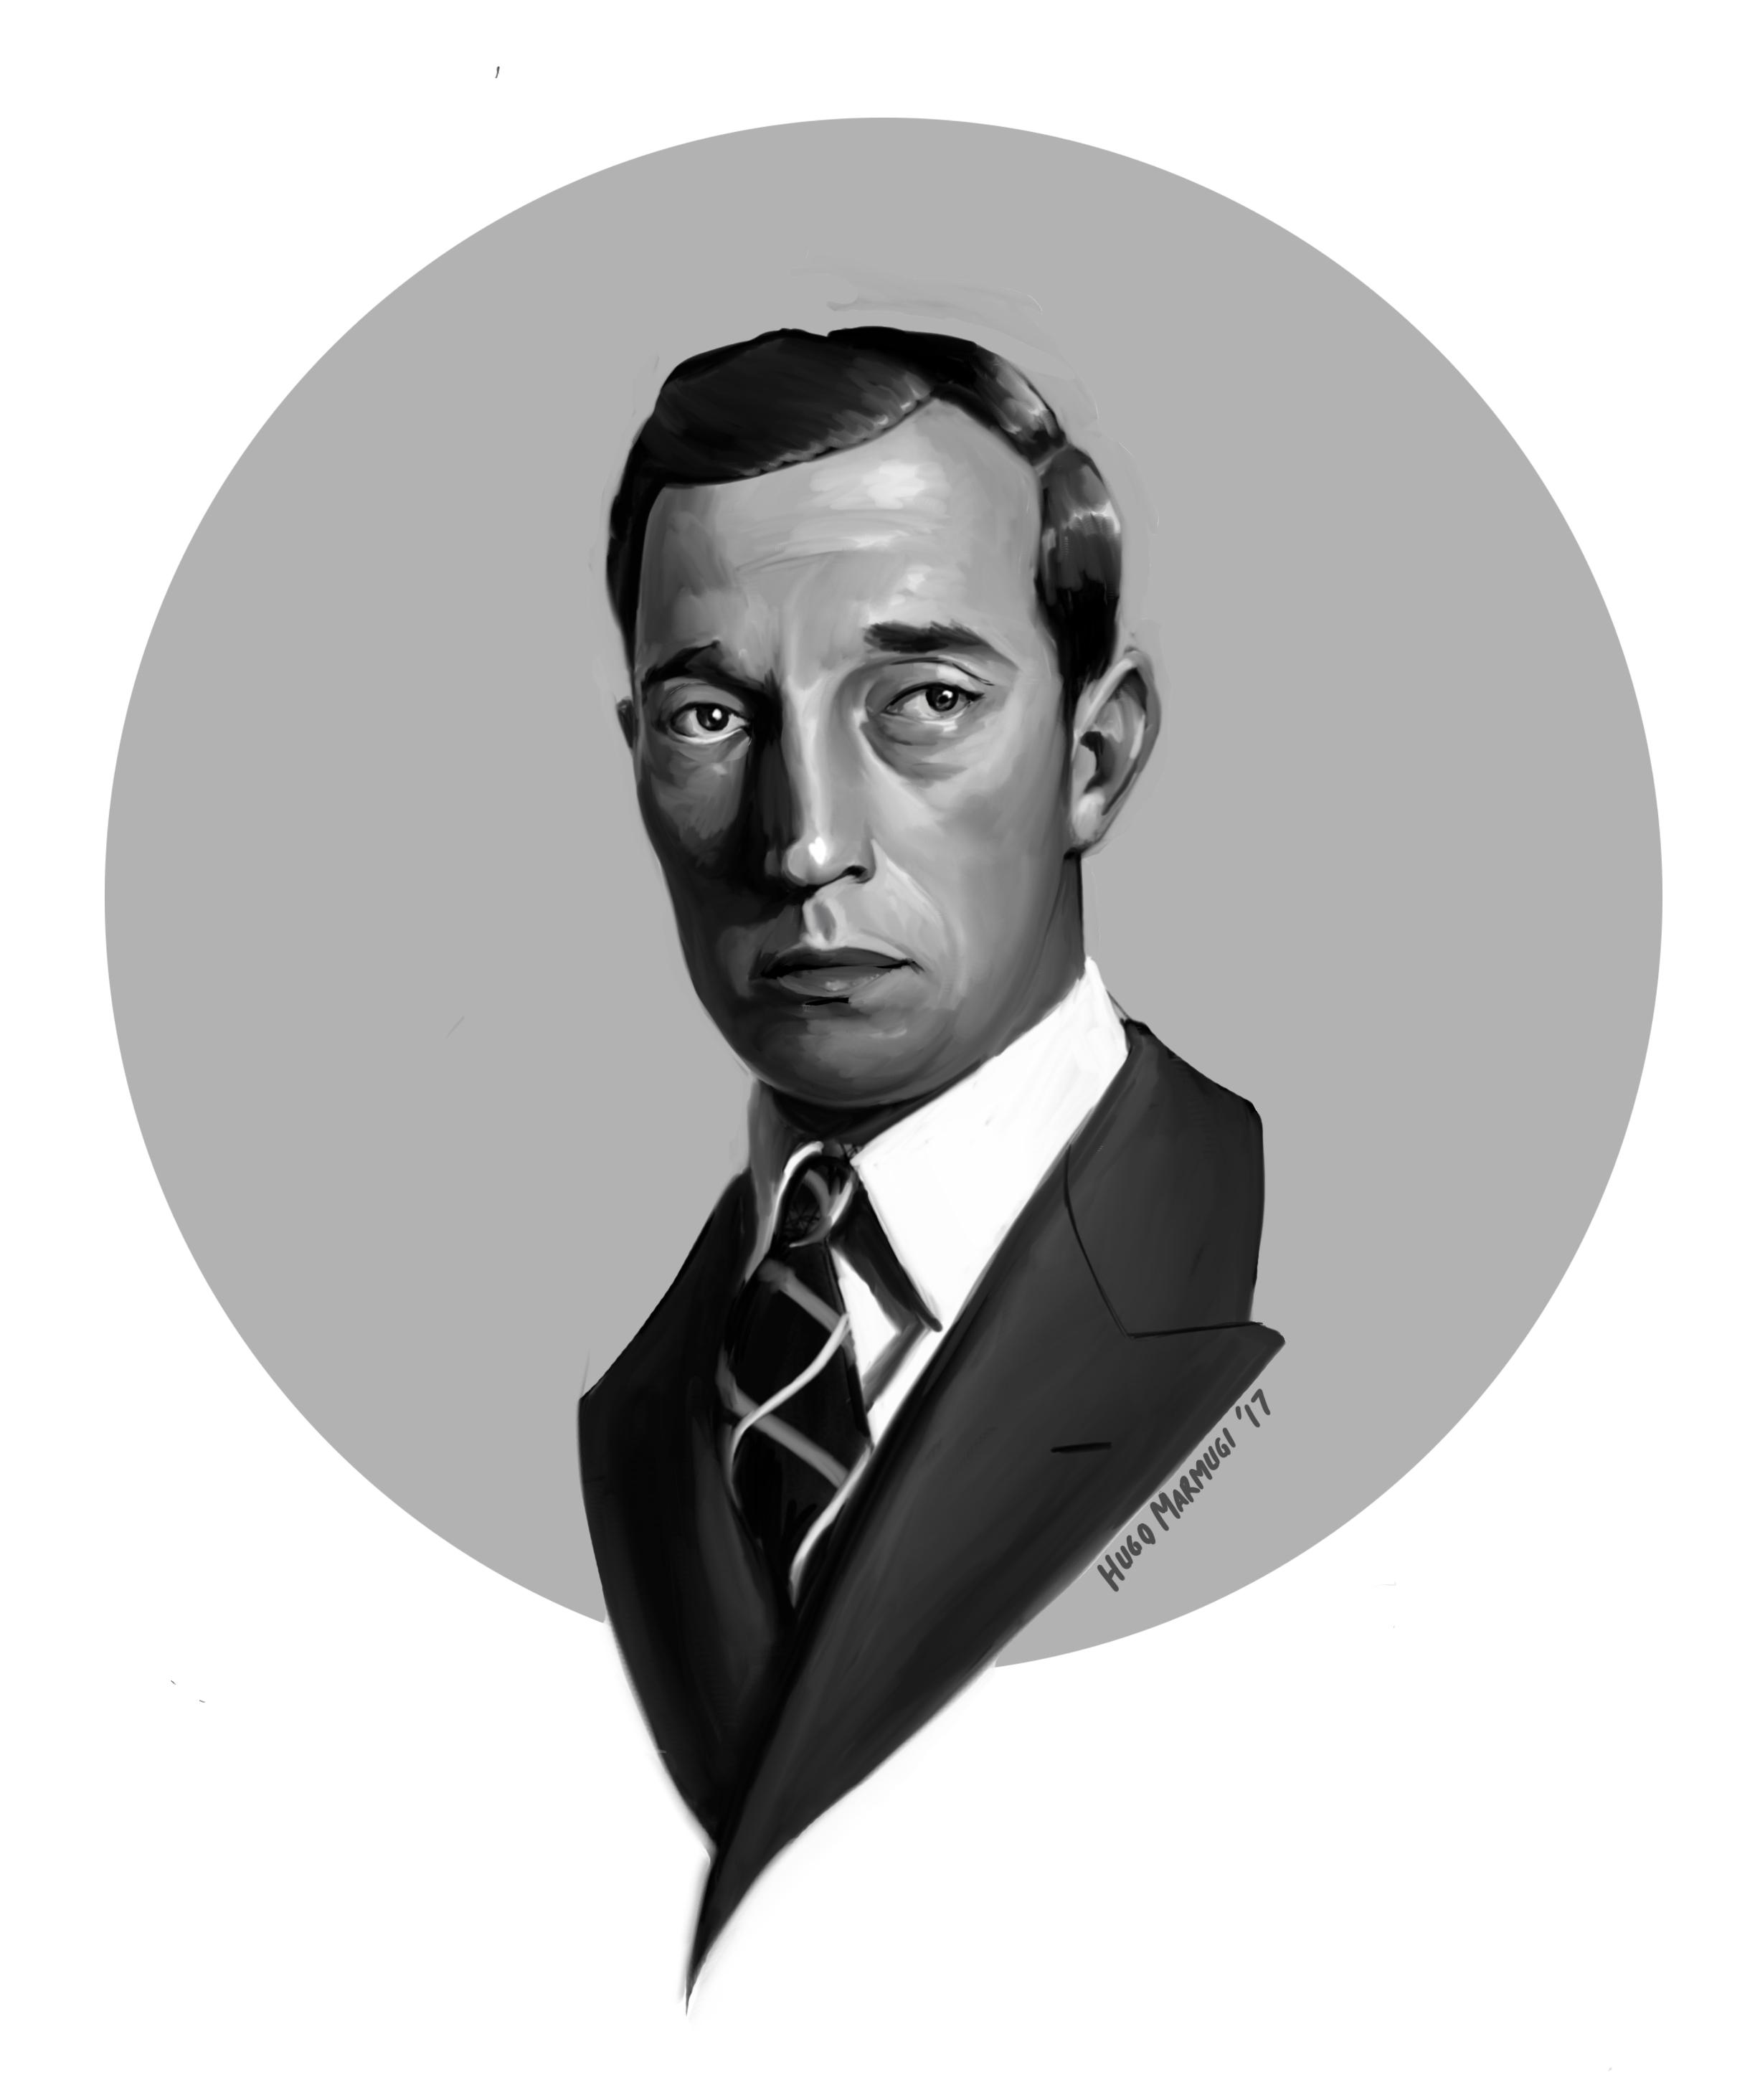 Buster Keaton illustration by the fabulous Hugo Marmugi